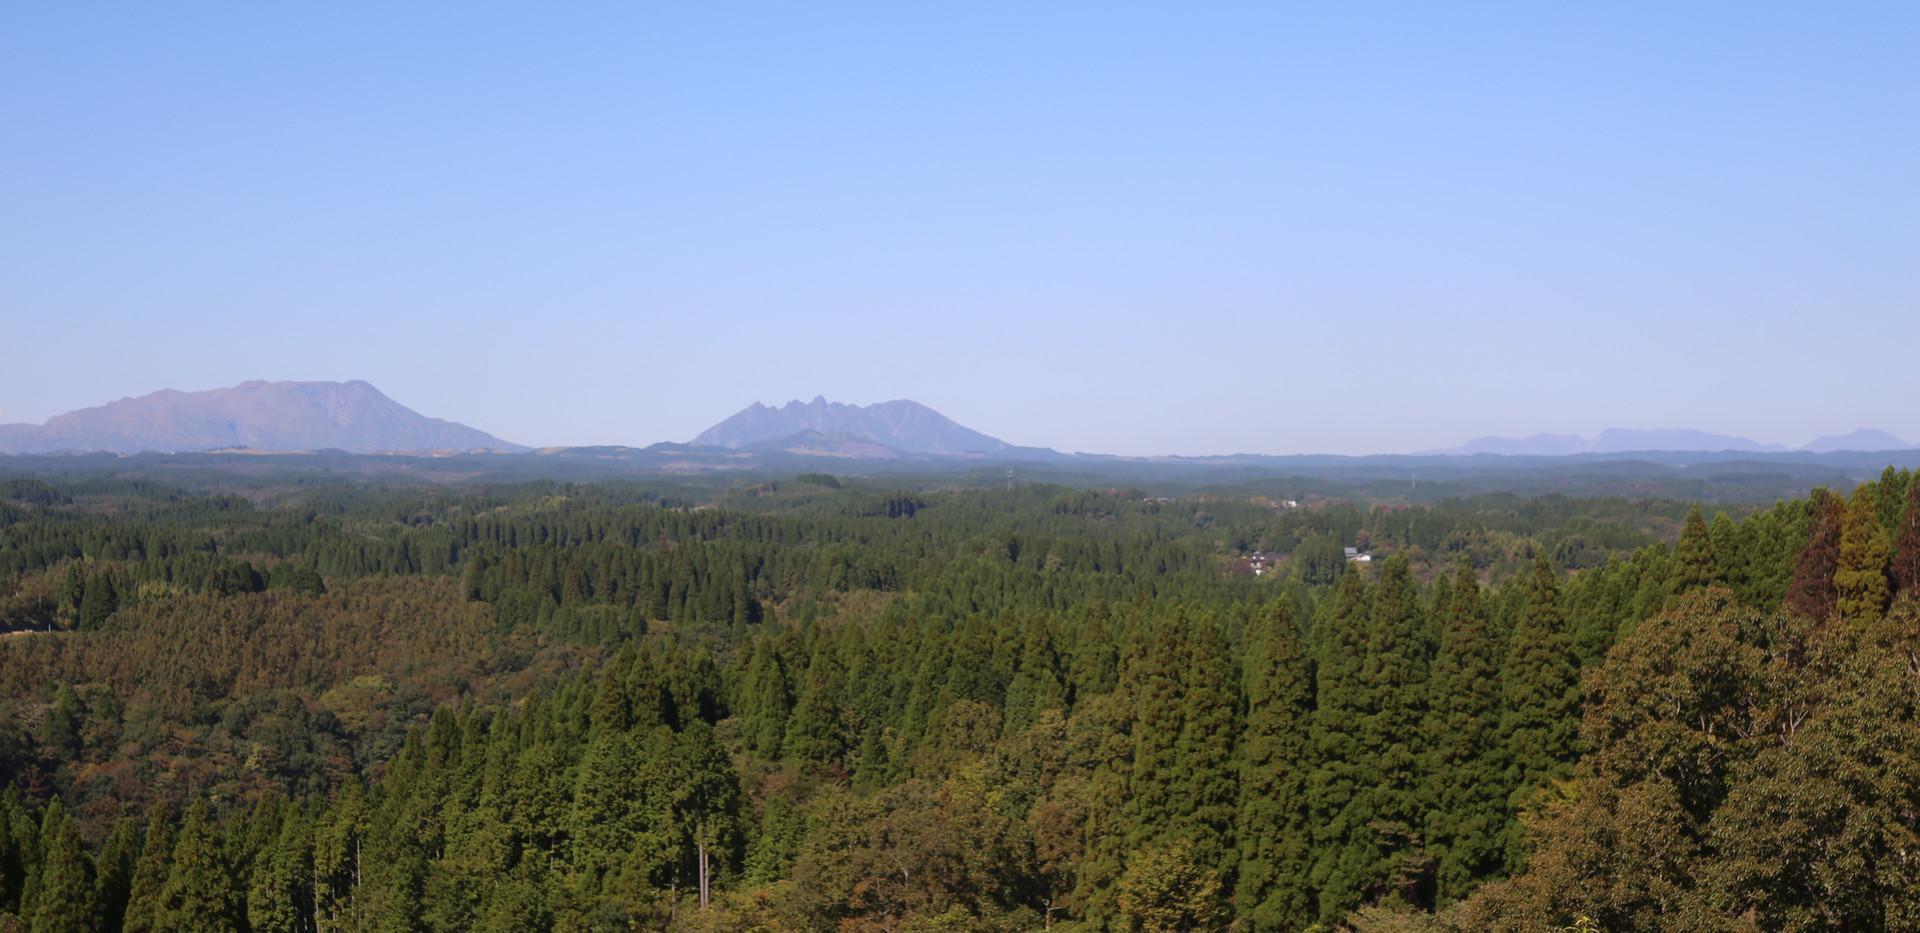 阿蘇五岳、九重連山が一望